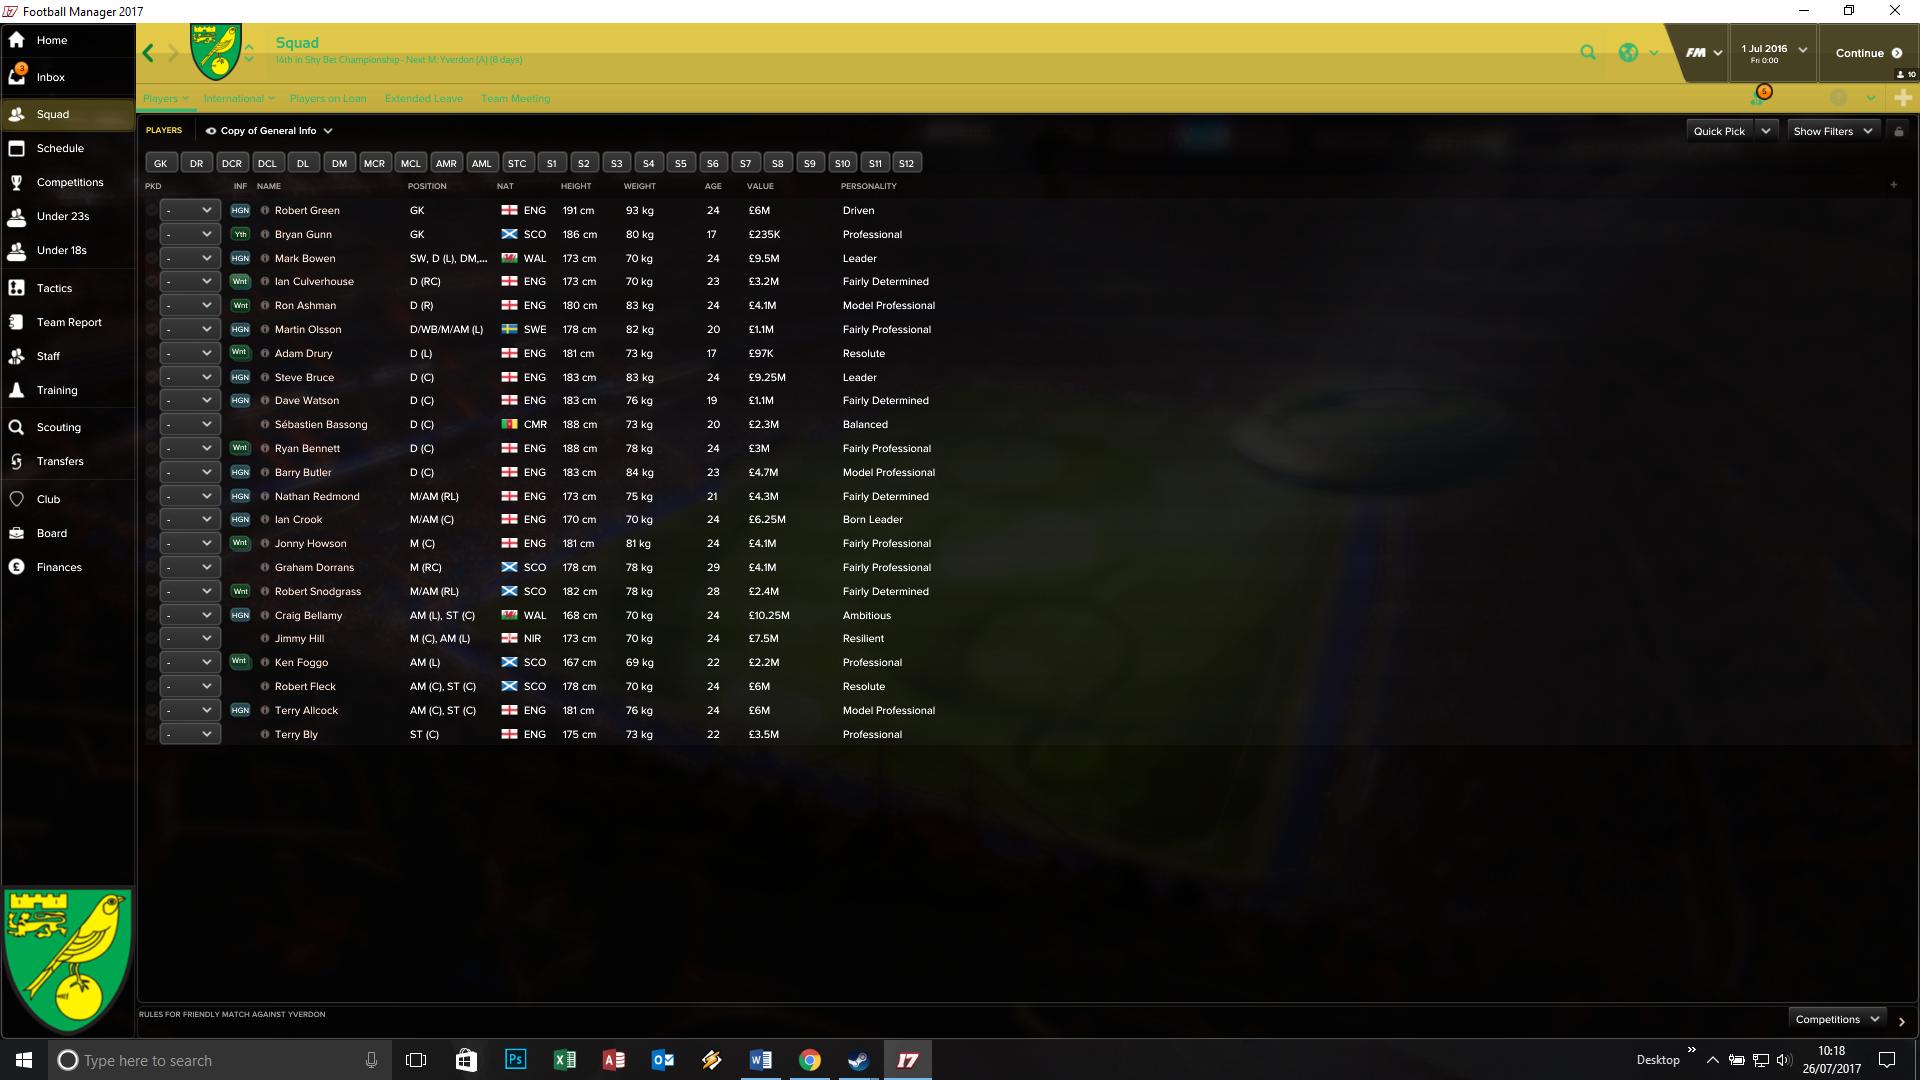 Norwich_Squad.png